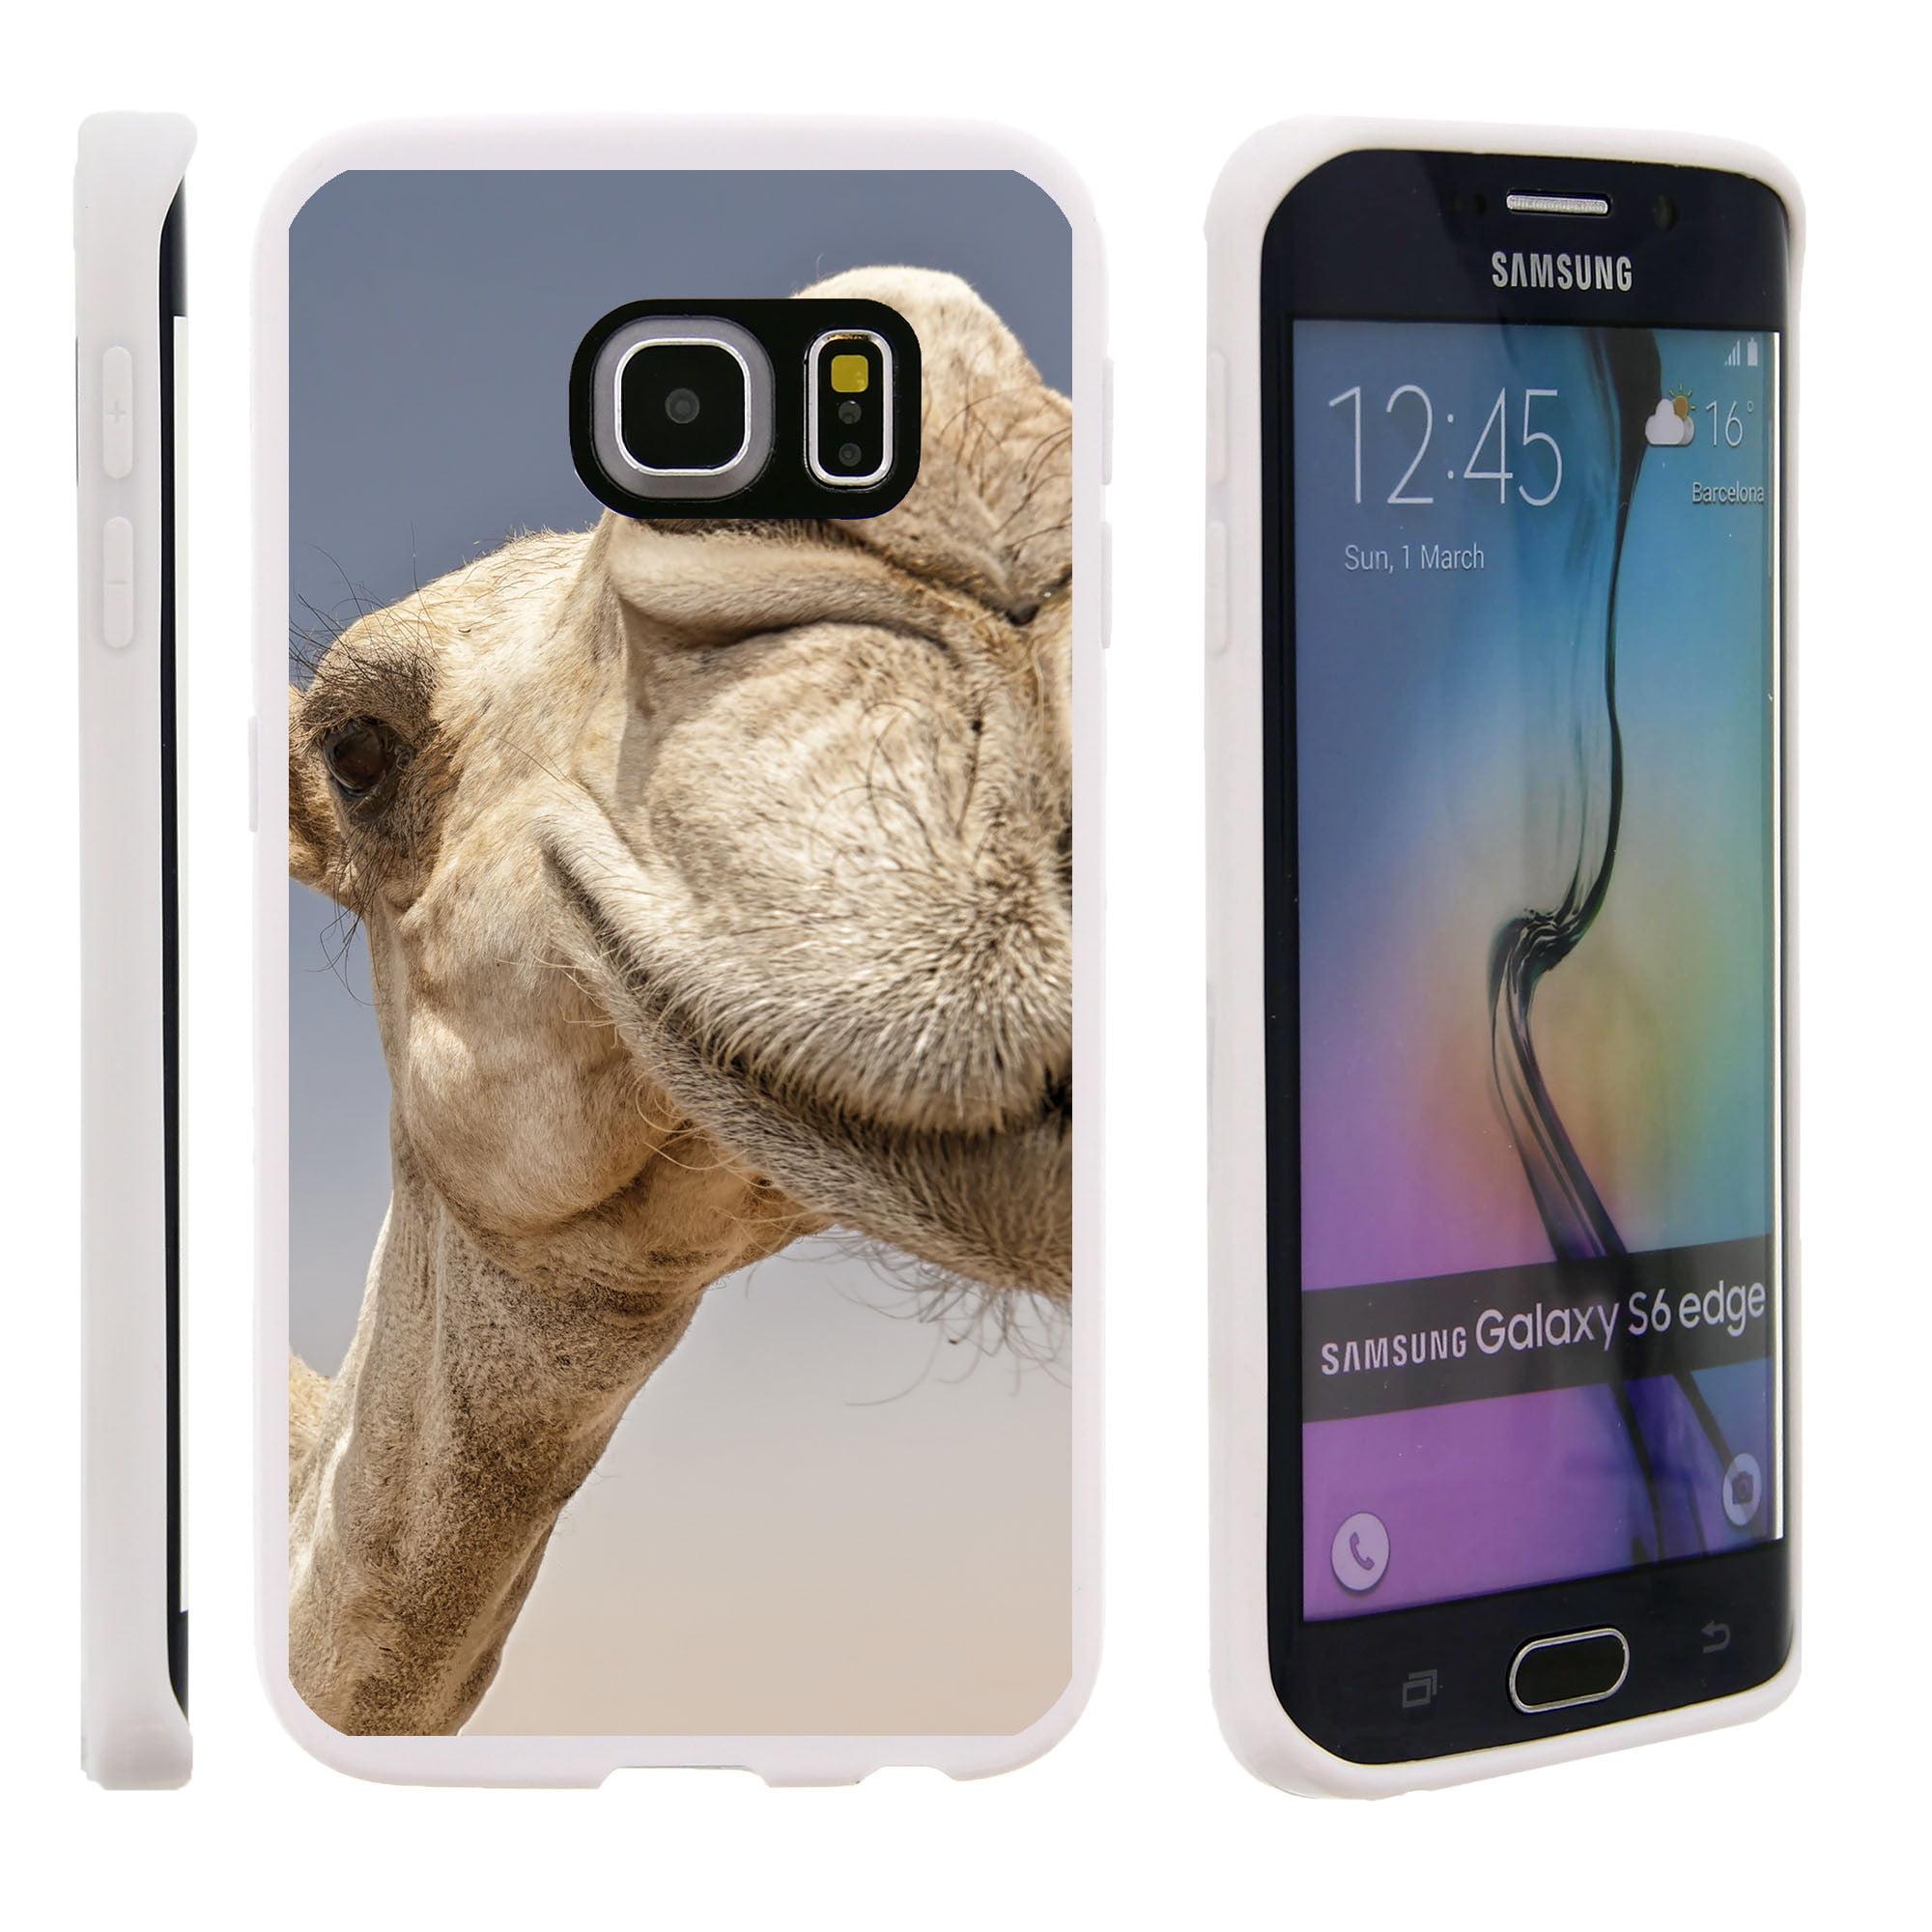 Samsung Galaxy S6 Edge G925, Flexible Case [FLEX FORCE] Slim Durable TPU Sleek Bumper with Unique Designs - Camel Close Up